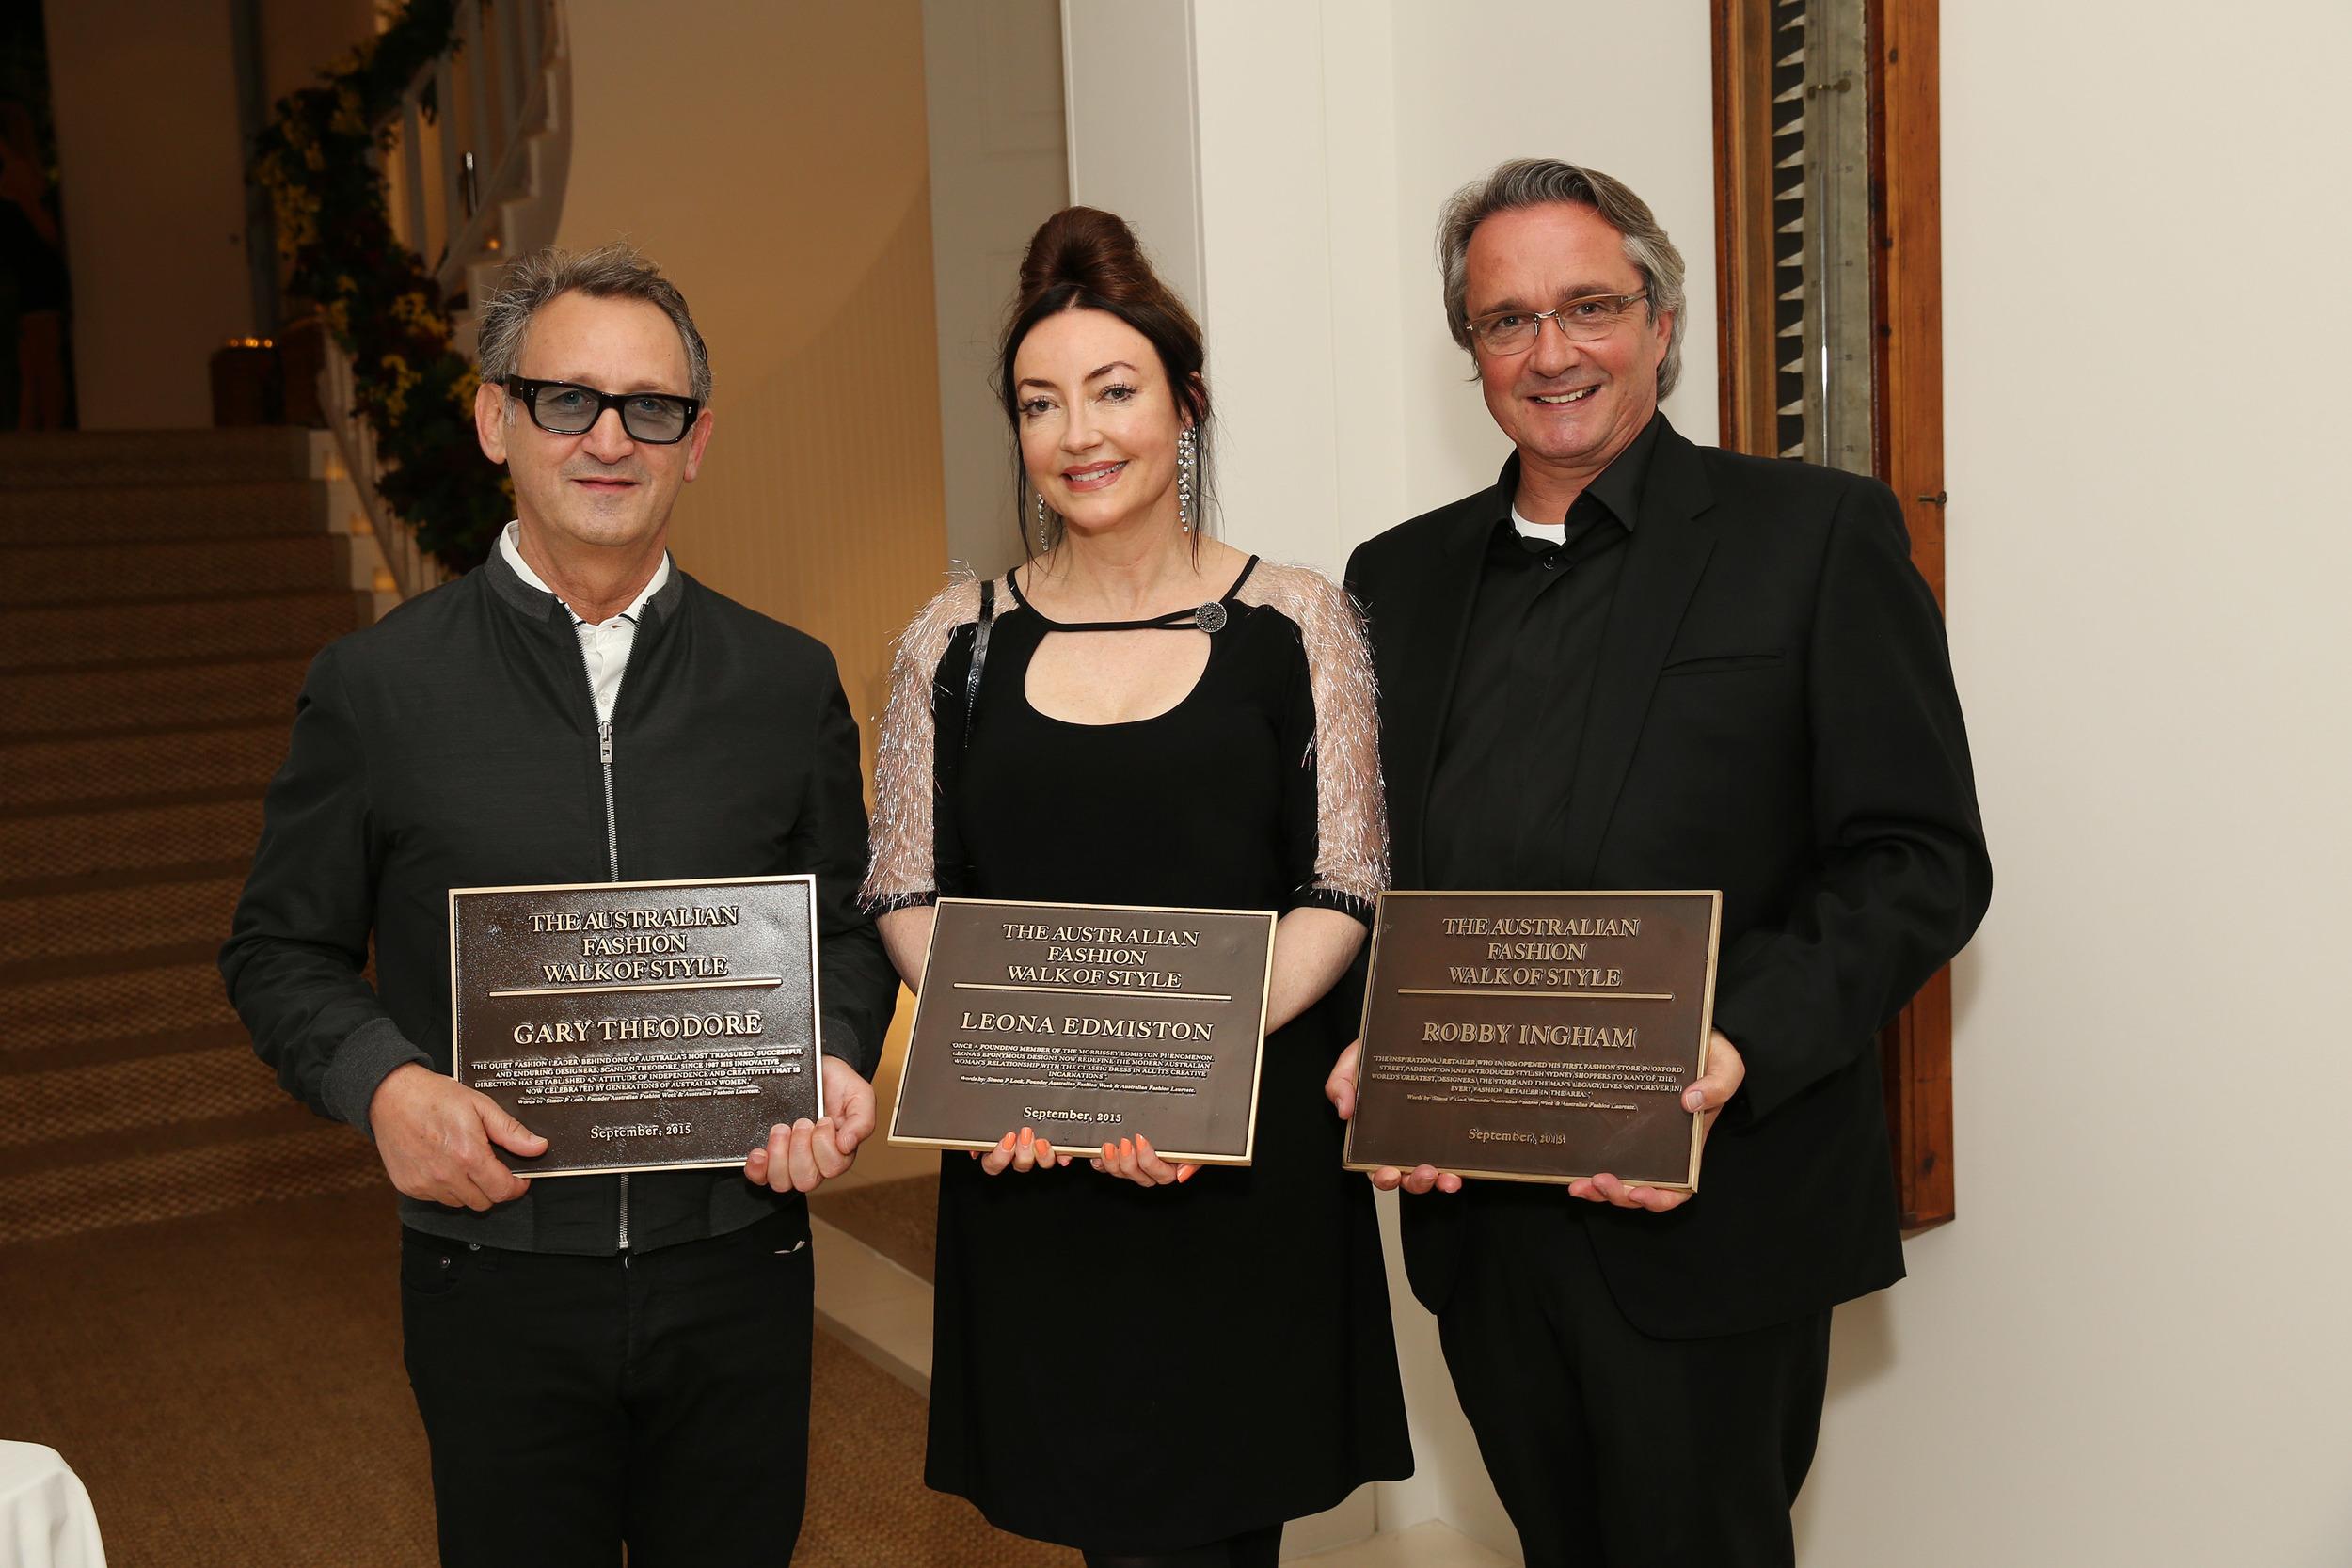 Gary Theodore, Leona Edmiston and Robby Ingham